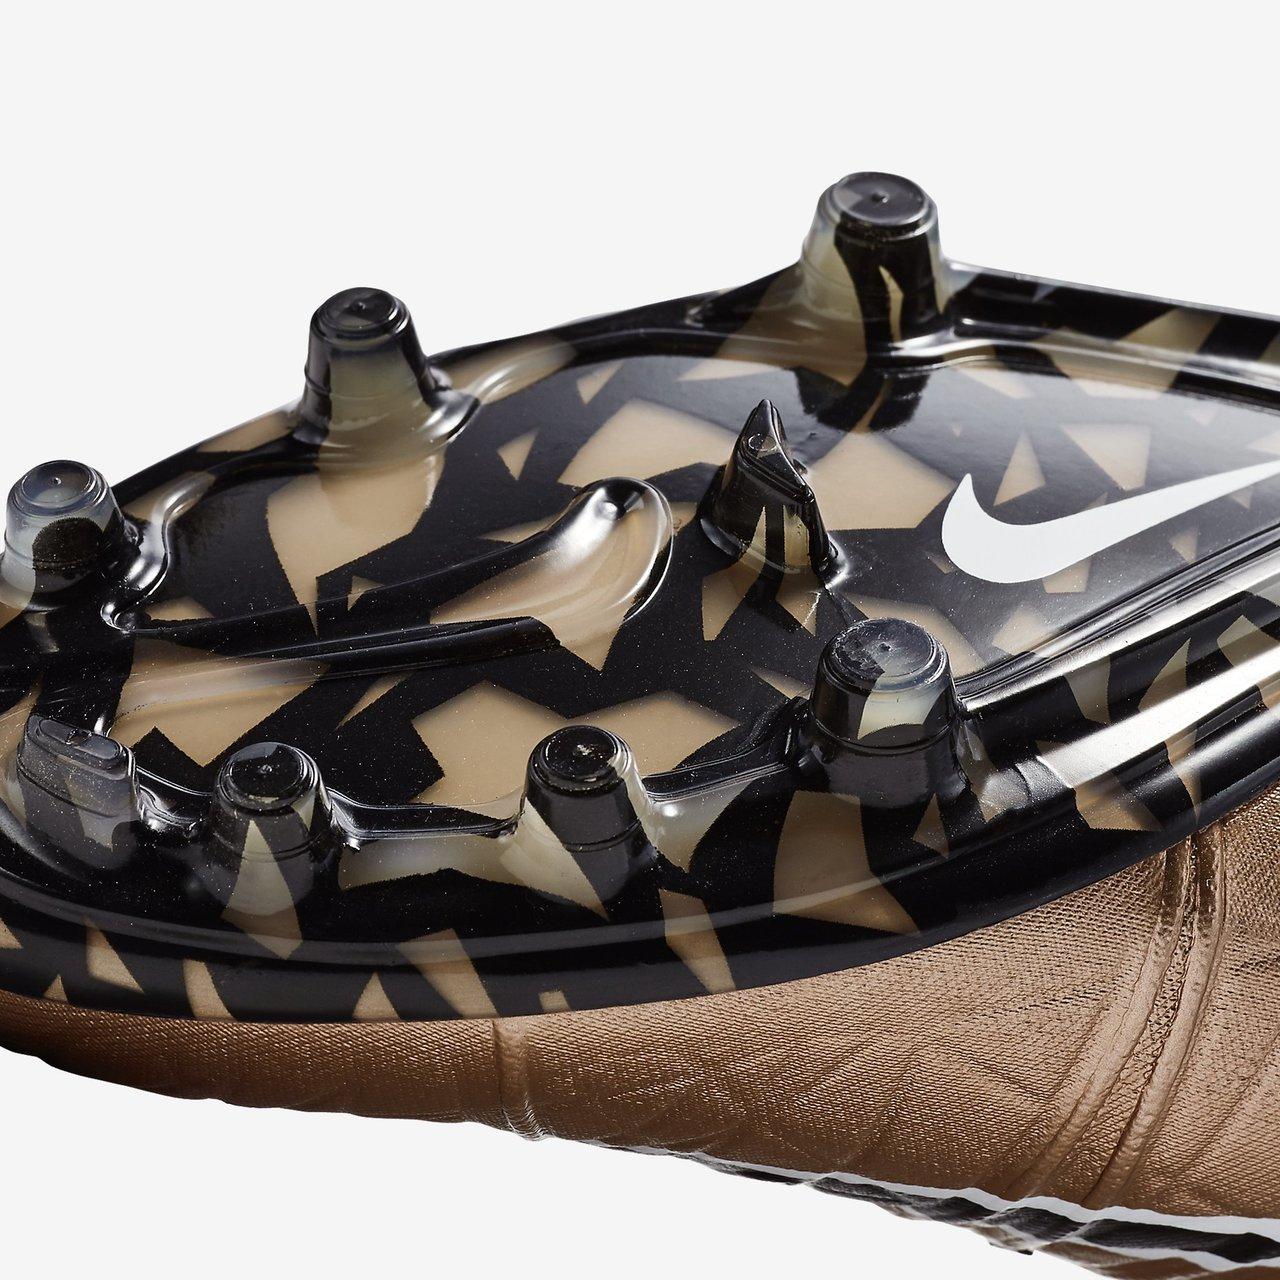 6e4c304c69df6 Nike Hypervenom Phantom II FG - Liquid Chrome Pack - Metallic Red ...